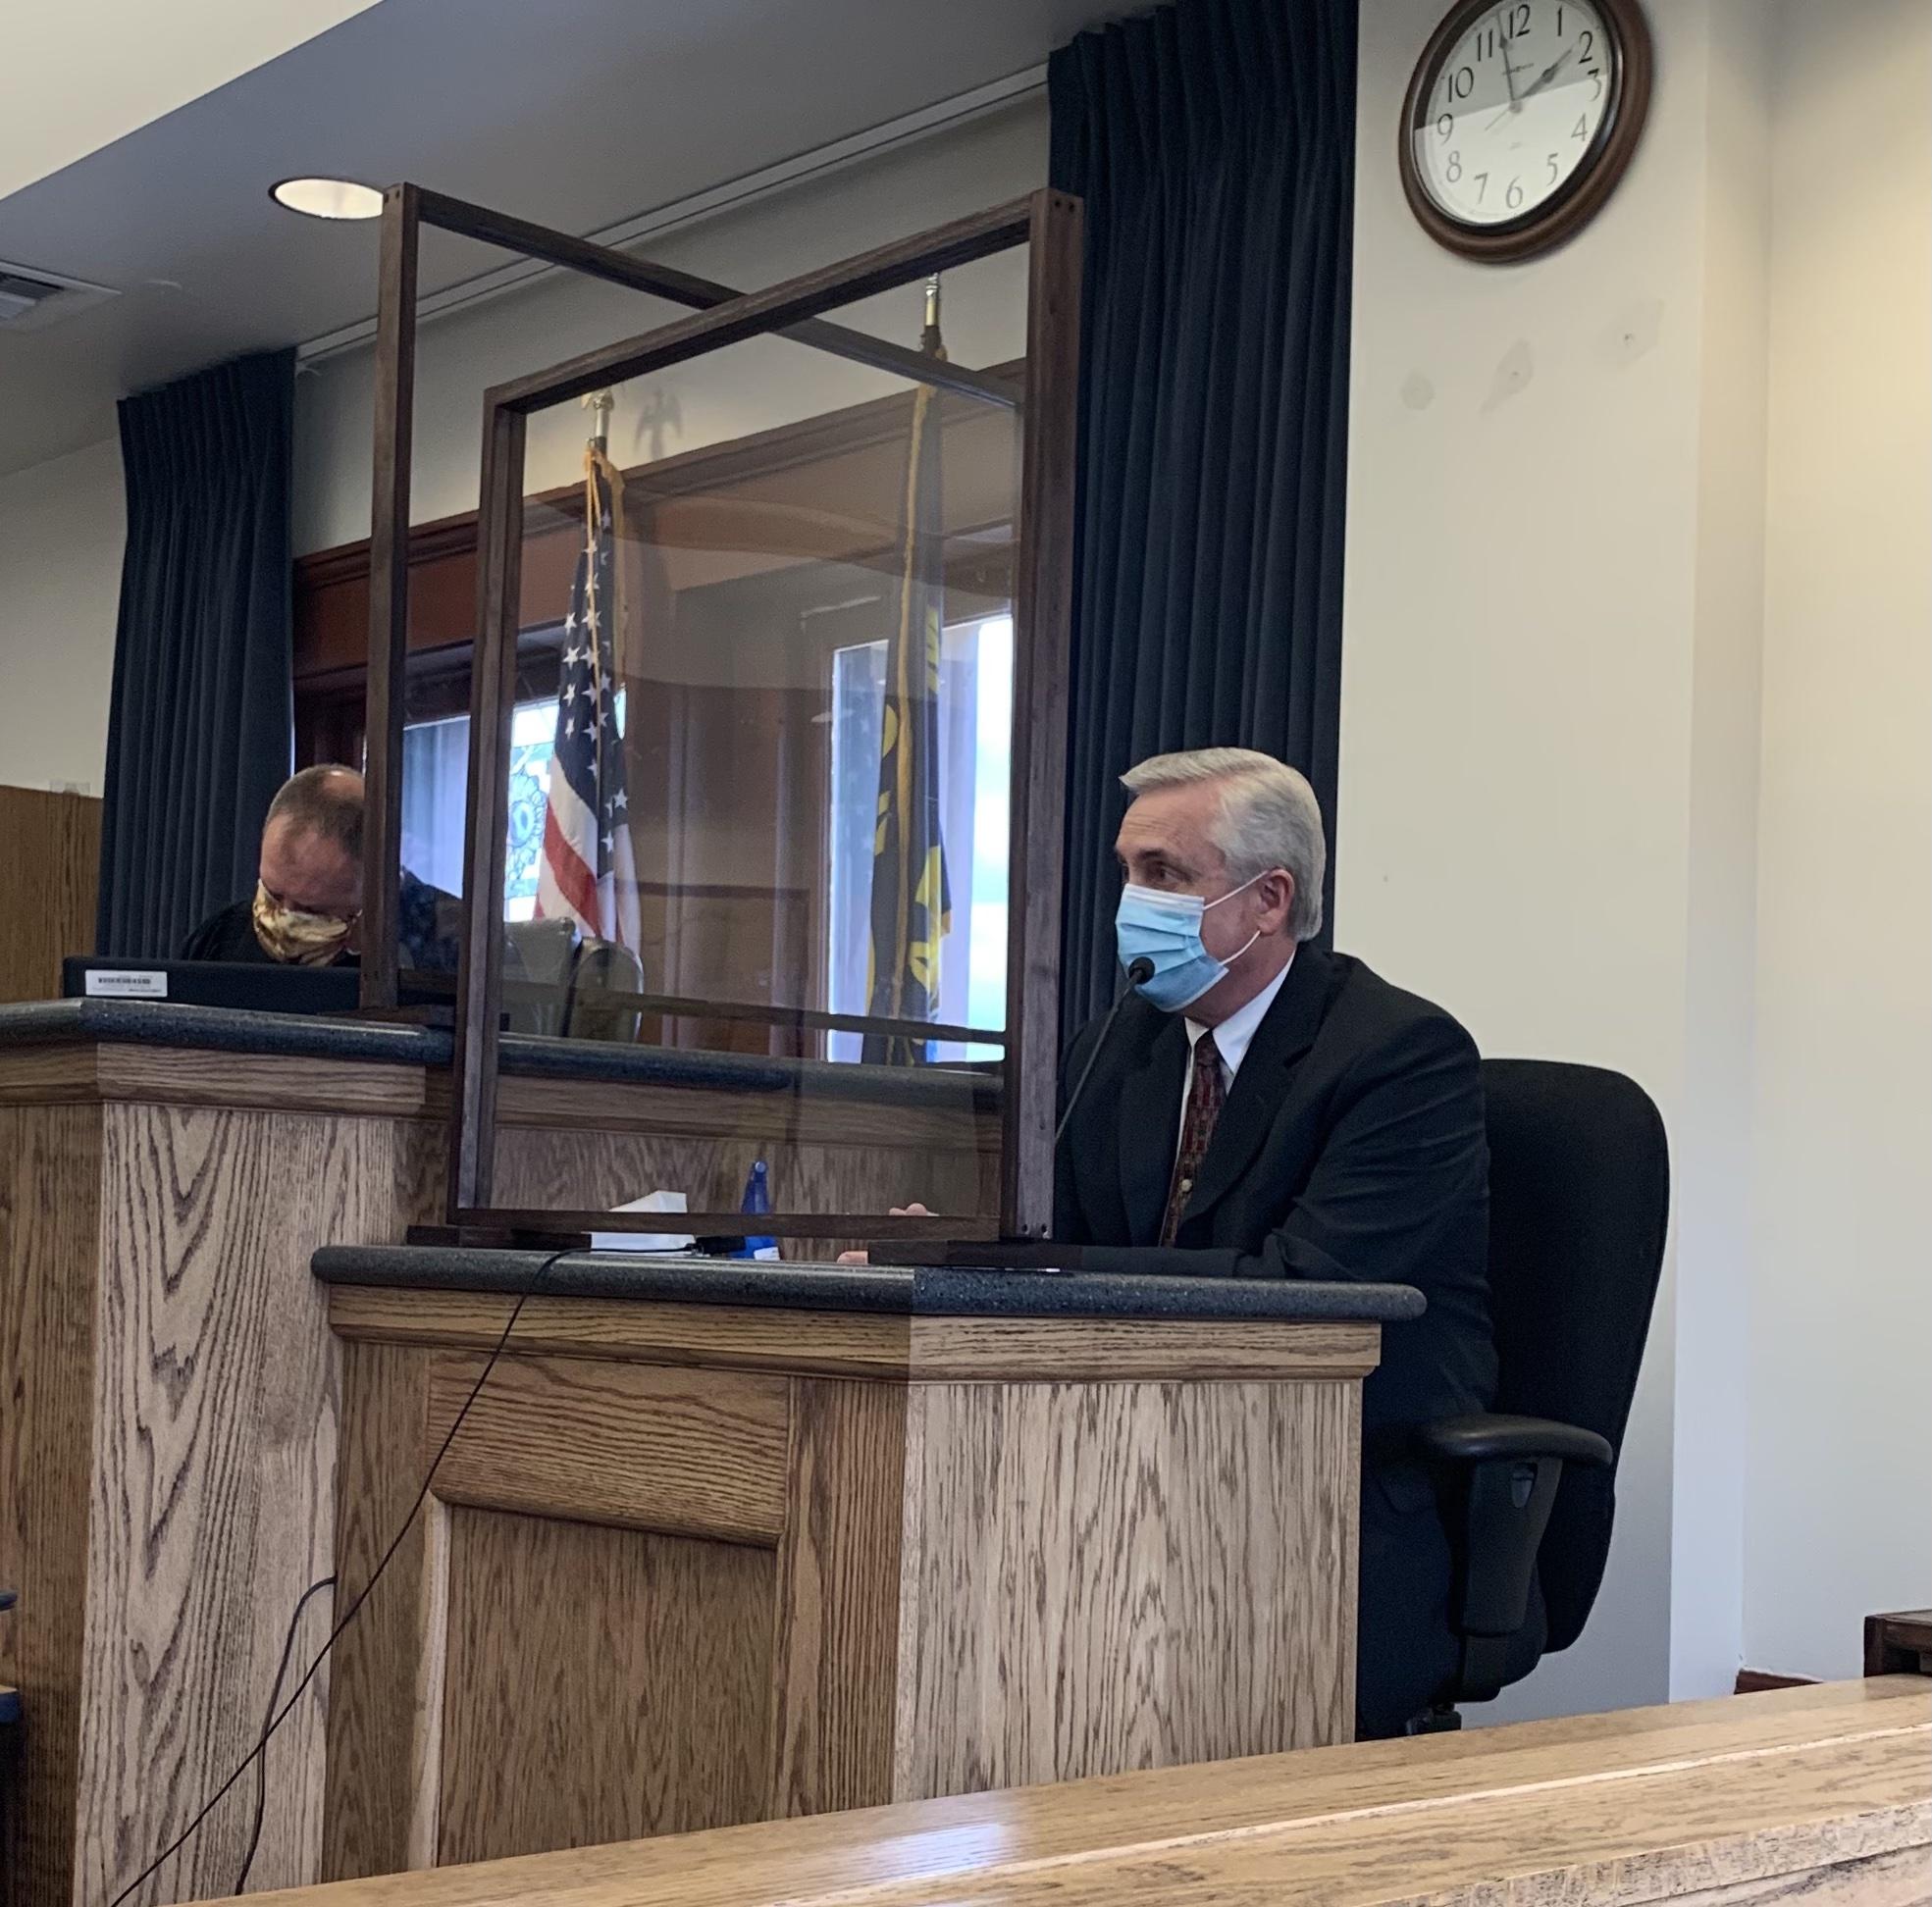 Supreme Court Justice testifies in case challenging Legislature's subpoena power